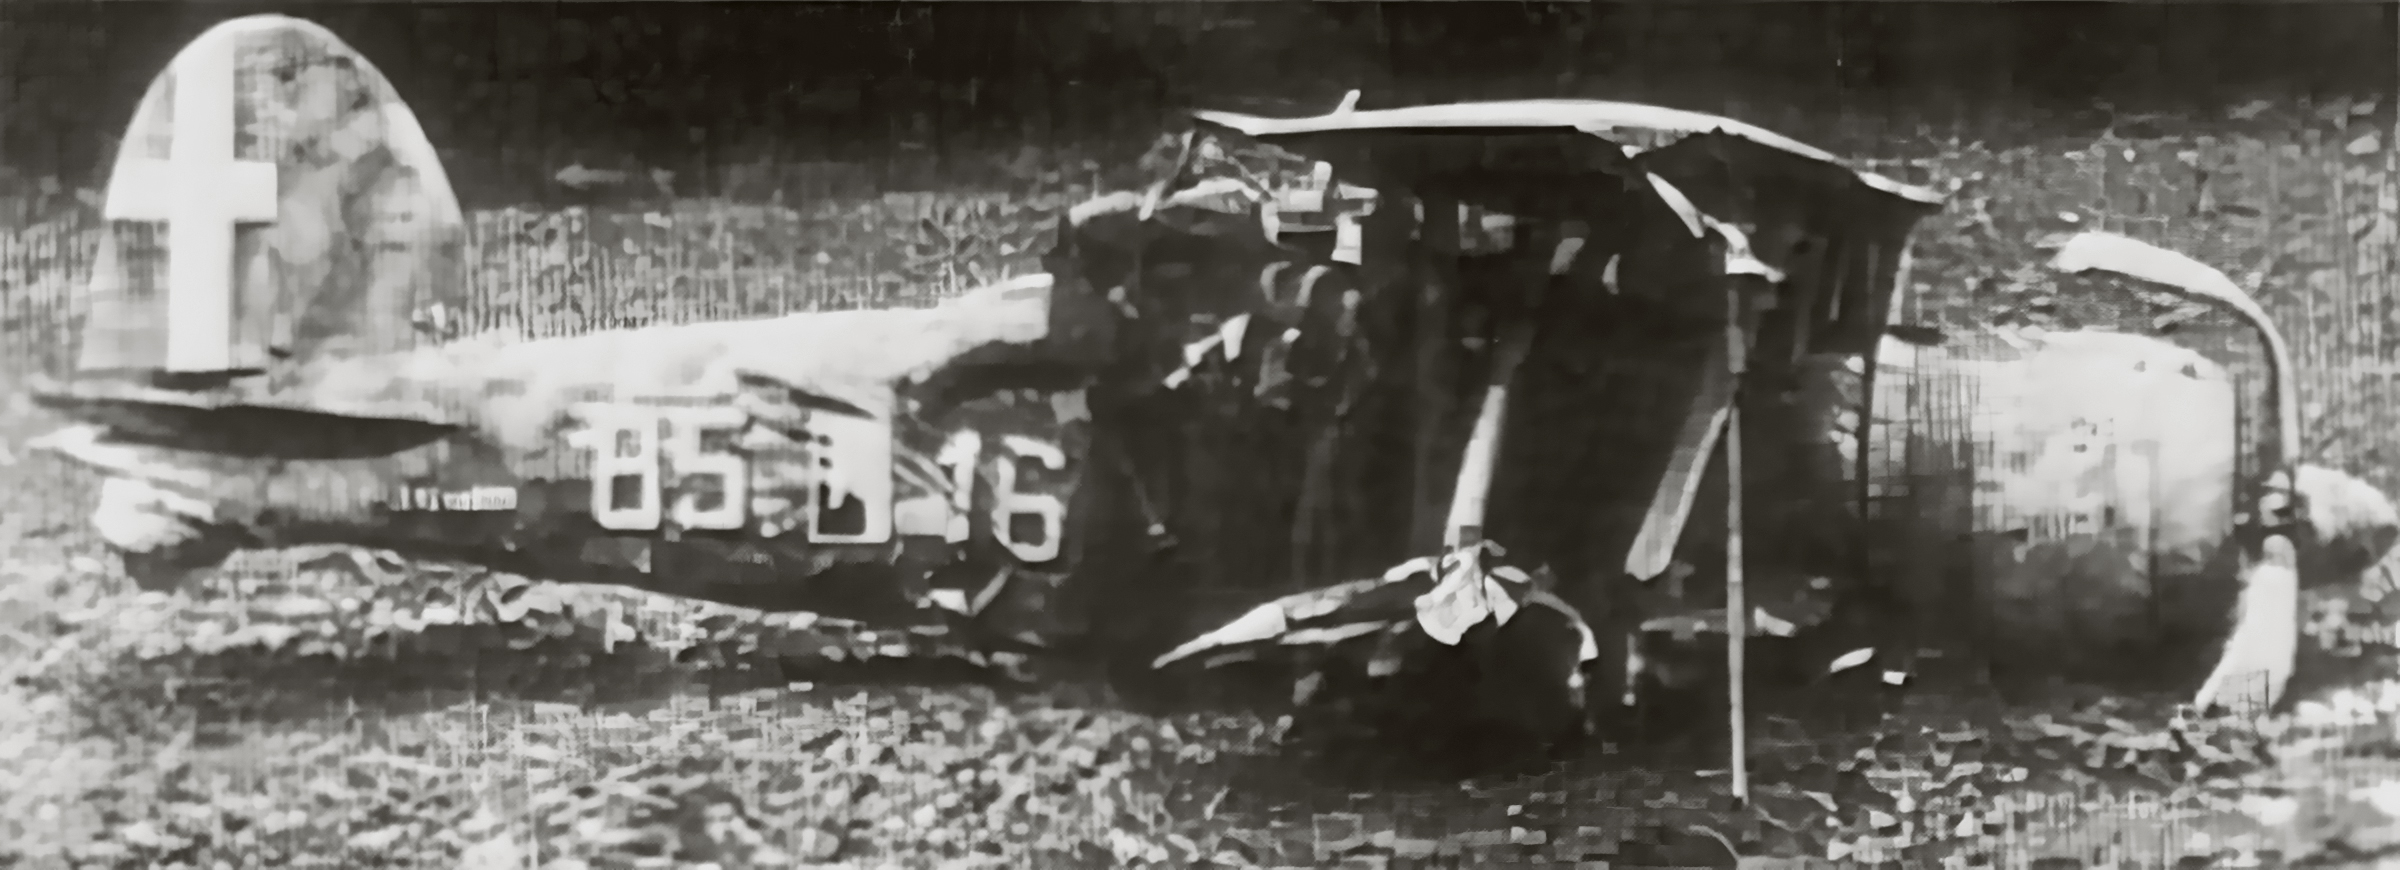 Fiat CR 42 Falco 18.JG56 56S18G85aSA 85 16 Antonio Lazzari landed 1940 01